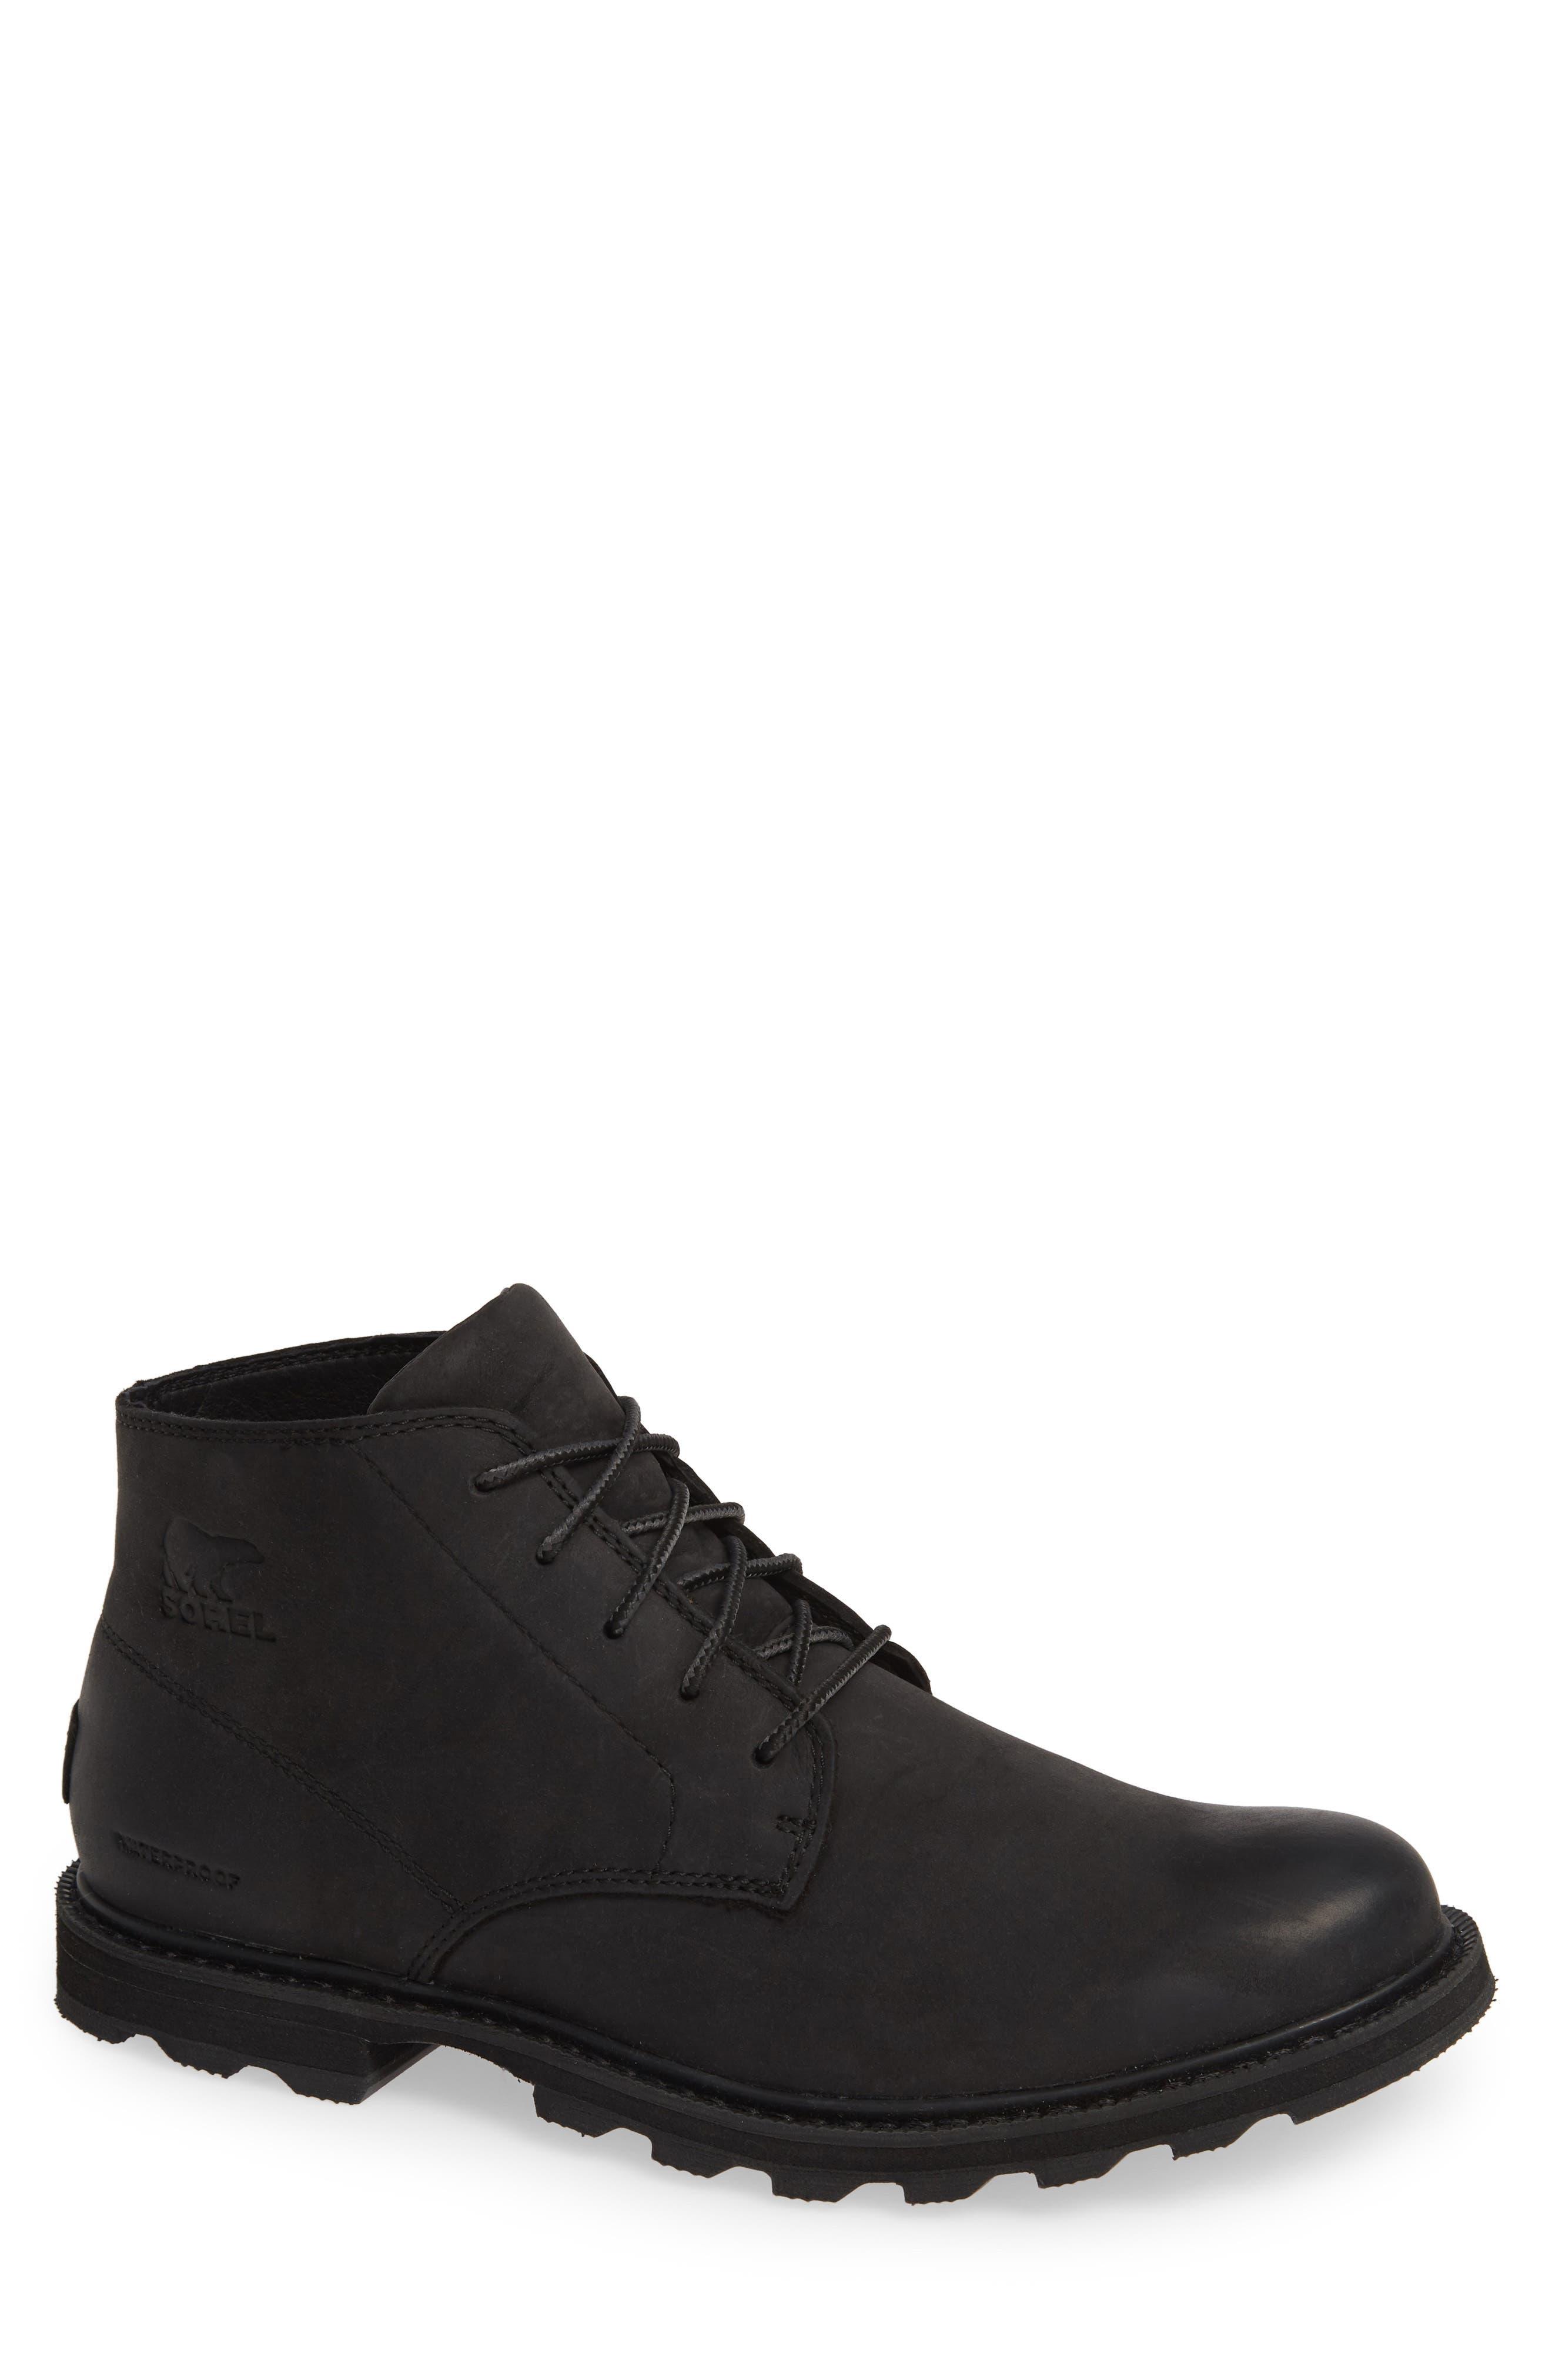 Madson Waterproof Boot,                         Main,                         color, BLACK/ BLACK